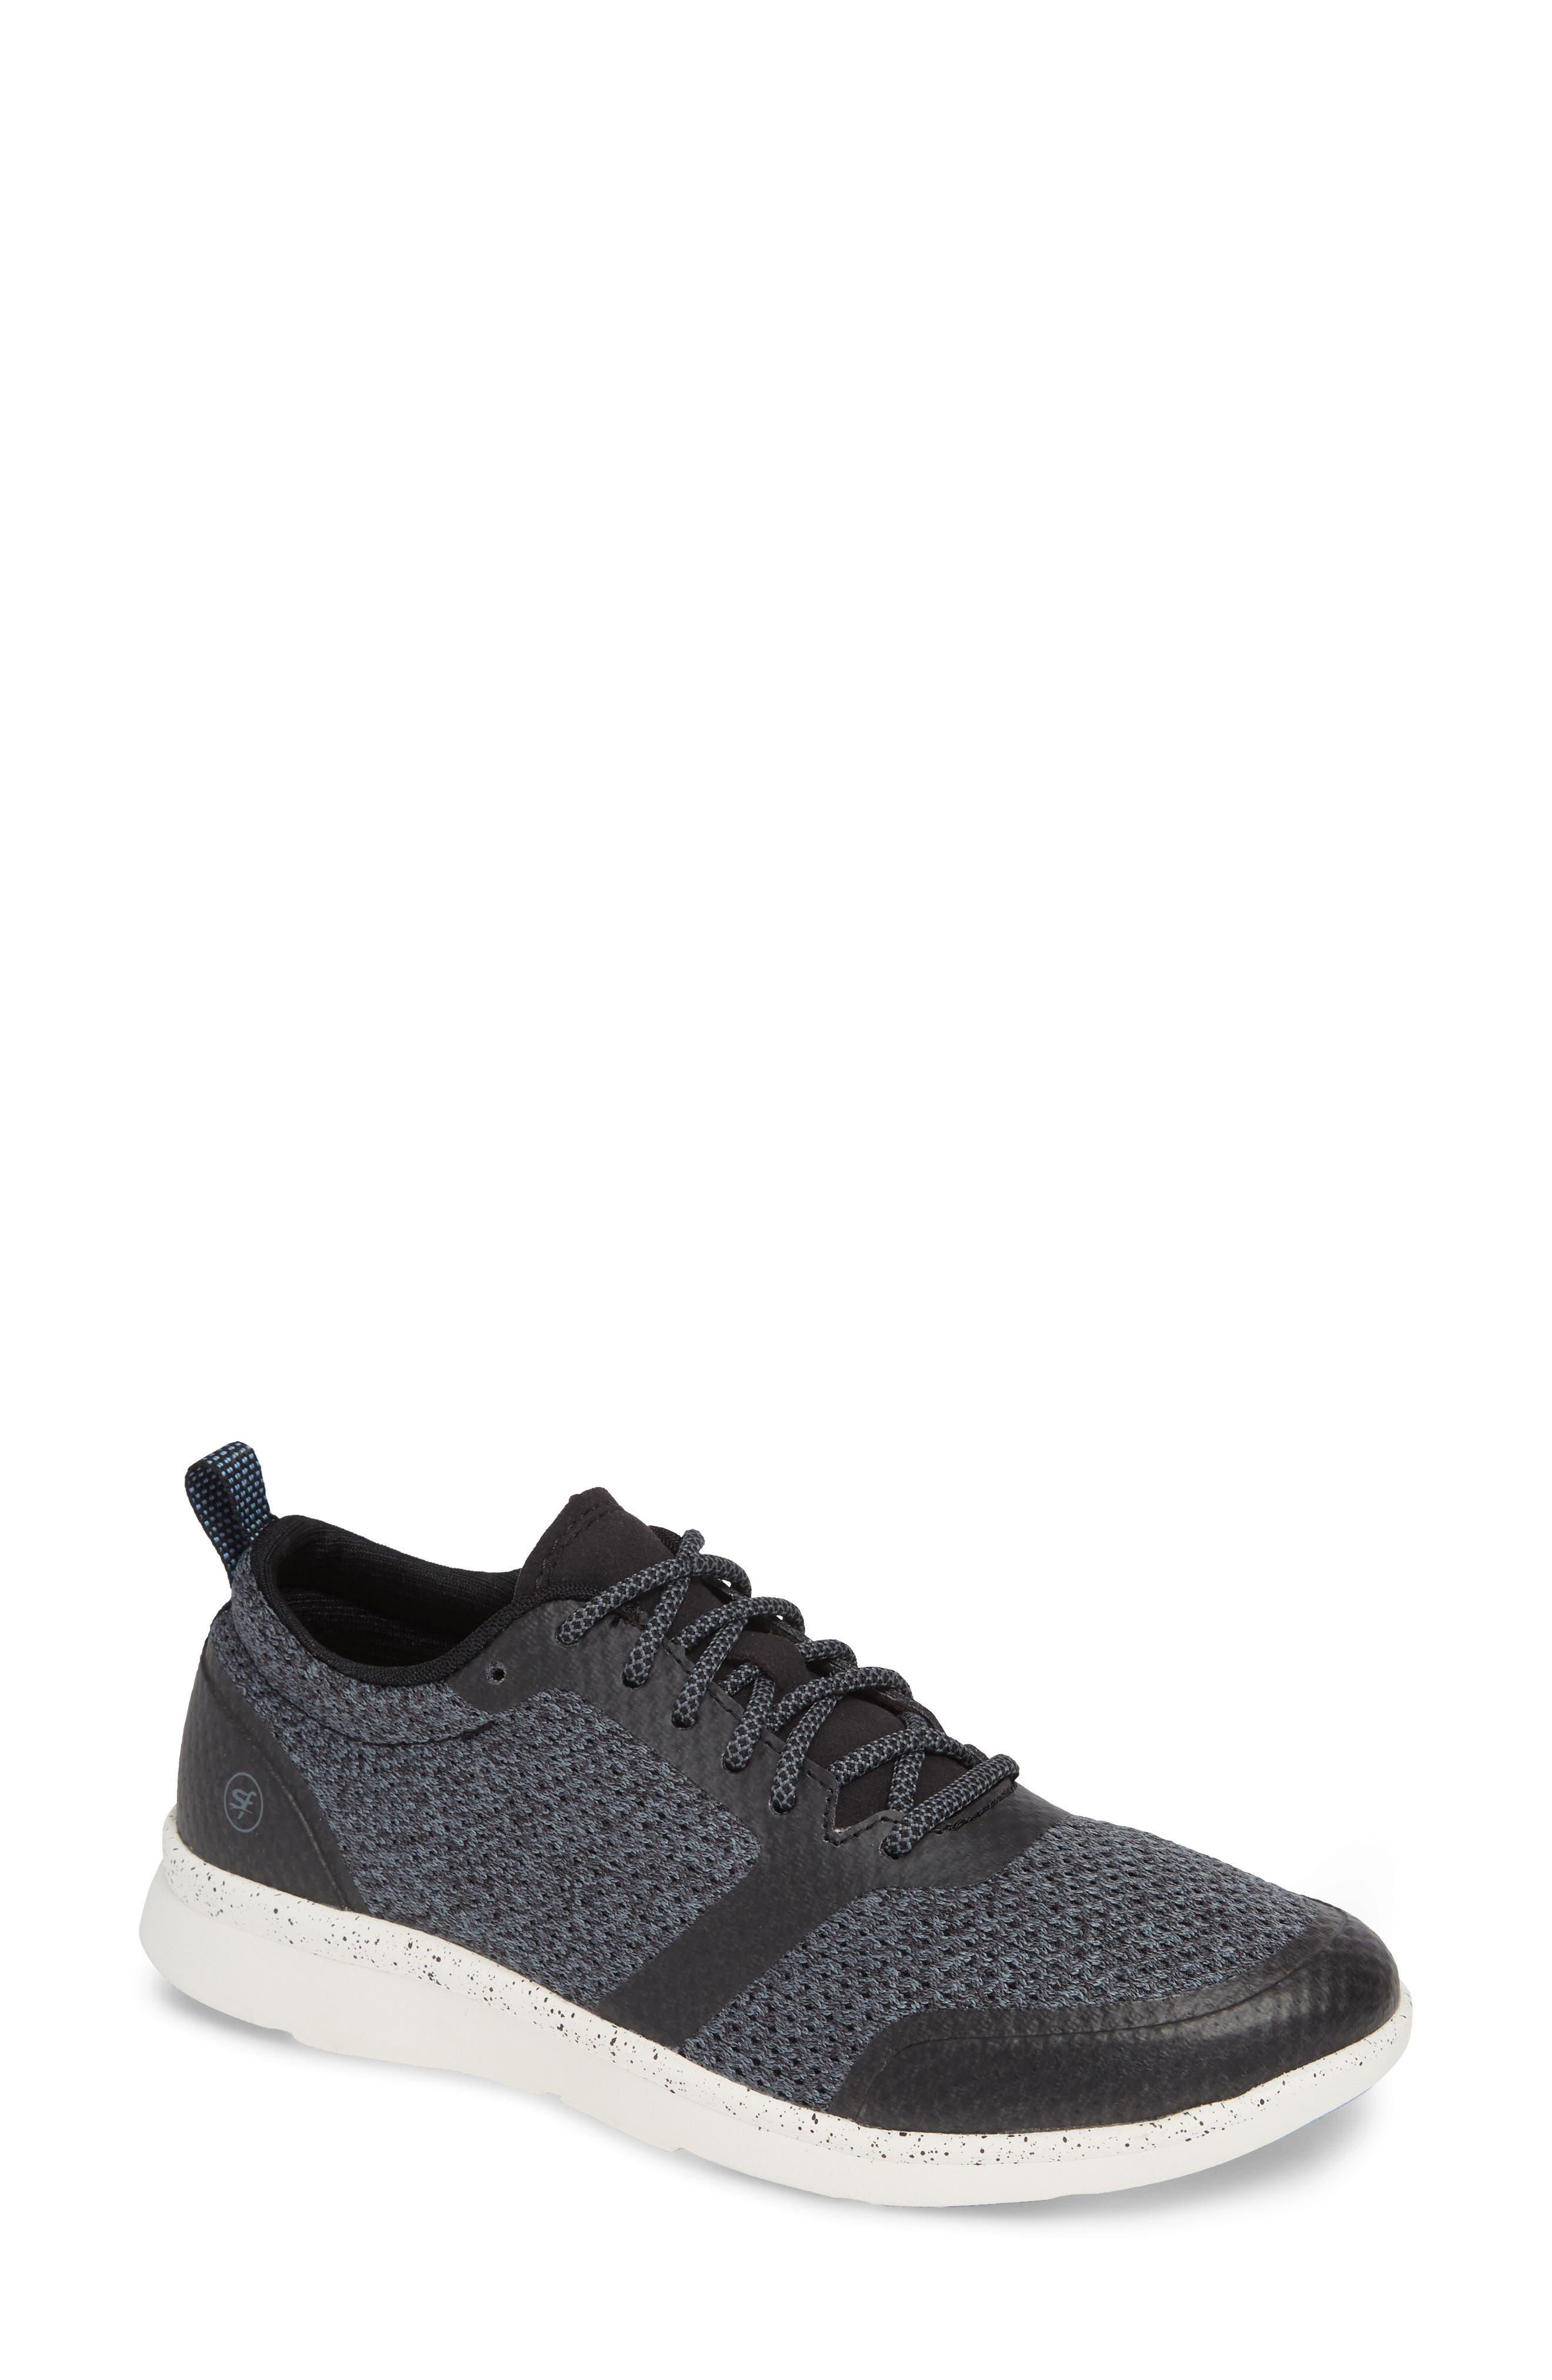 Linden Sneaker,                             Main thumbnail 1, color,                             BLACK FABRIC